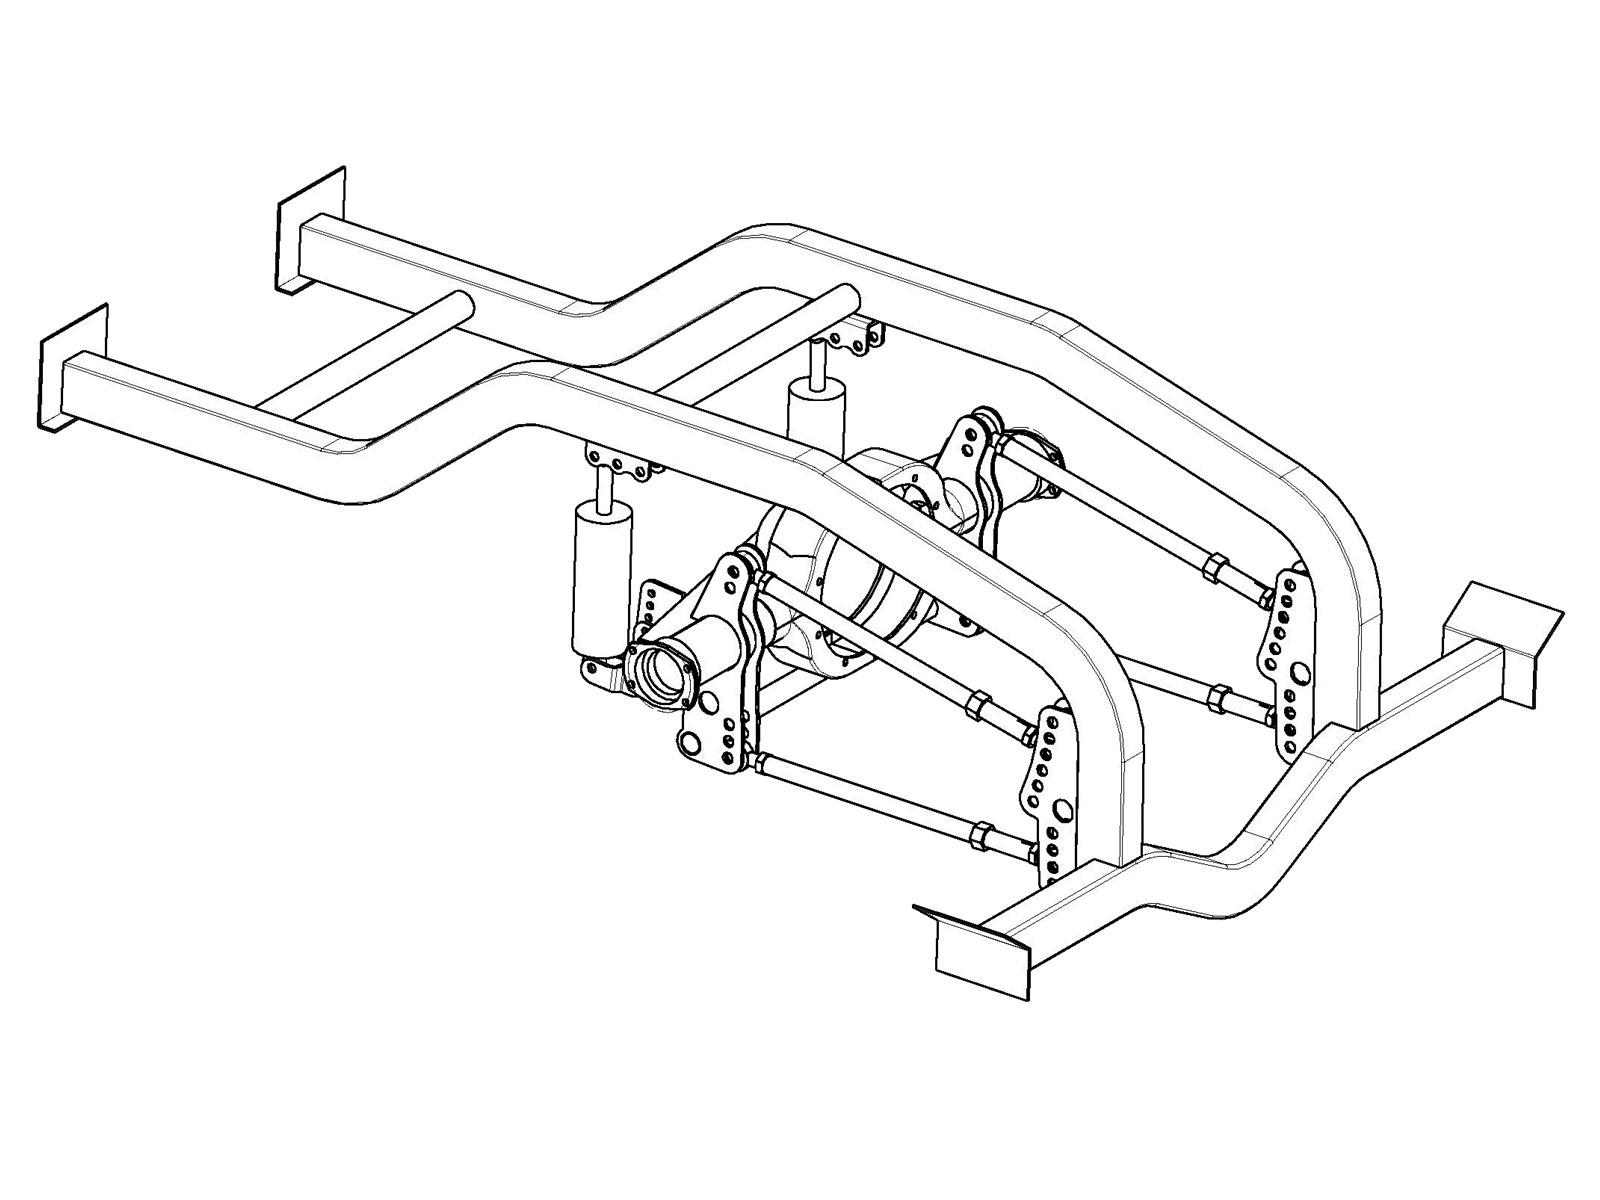 1929 chevy wiring diagram image wiring diagram engine